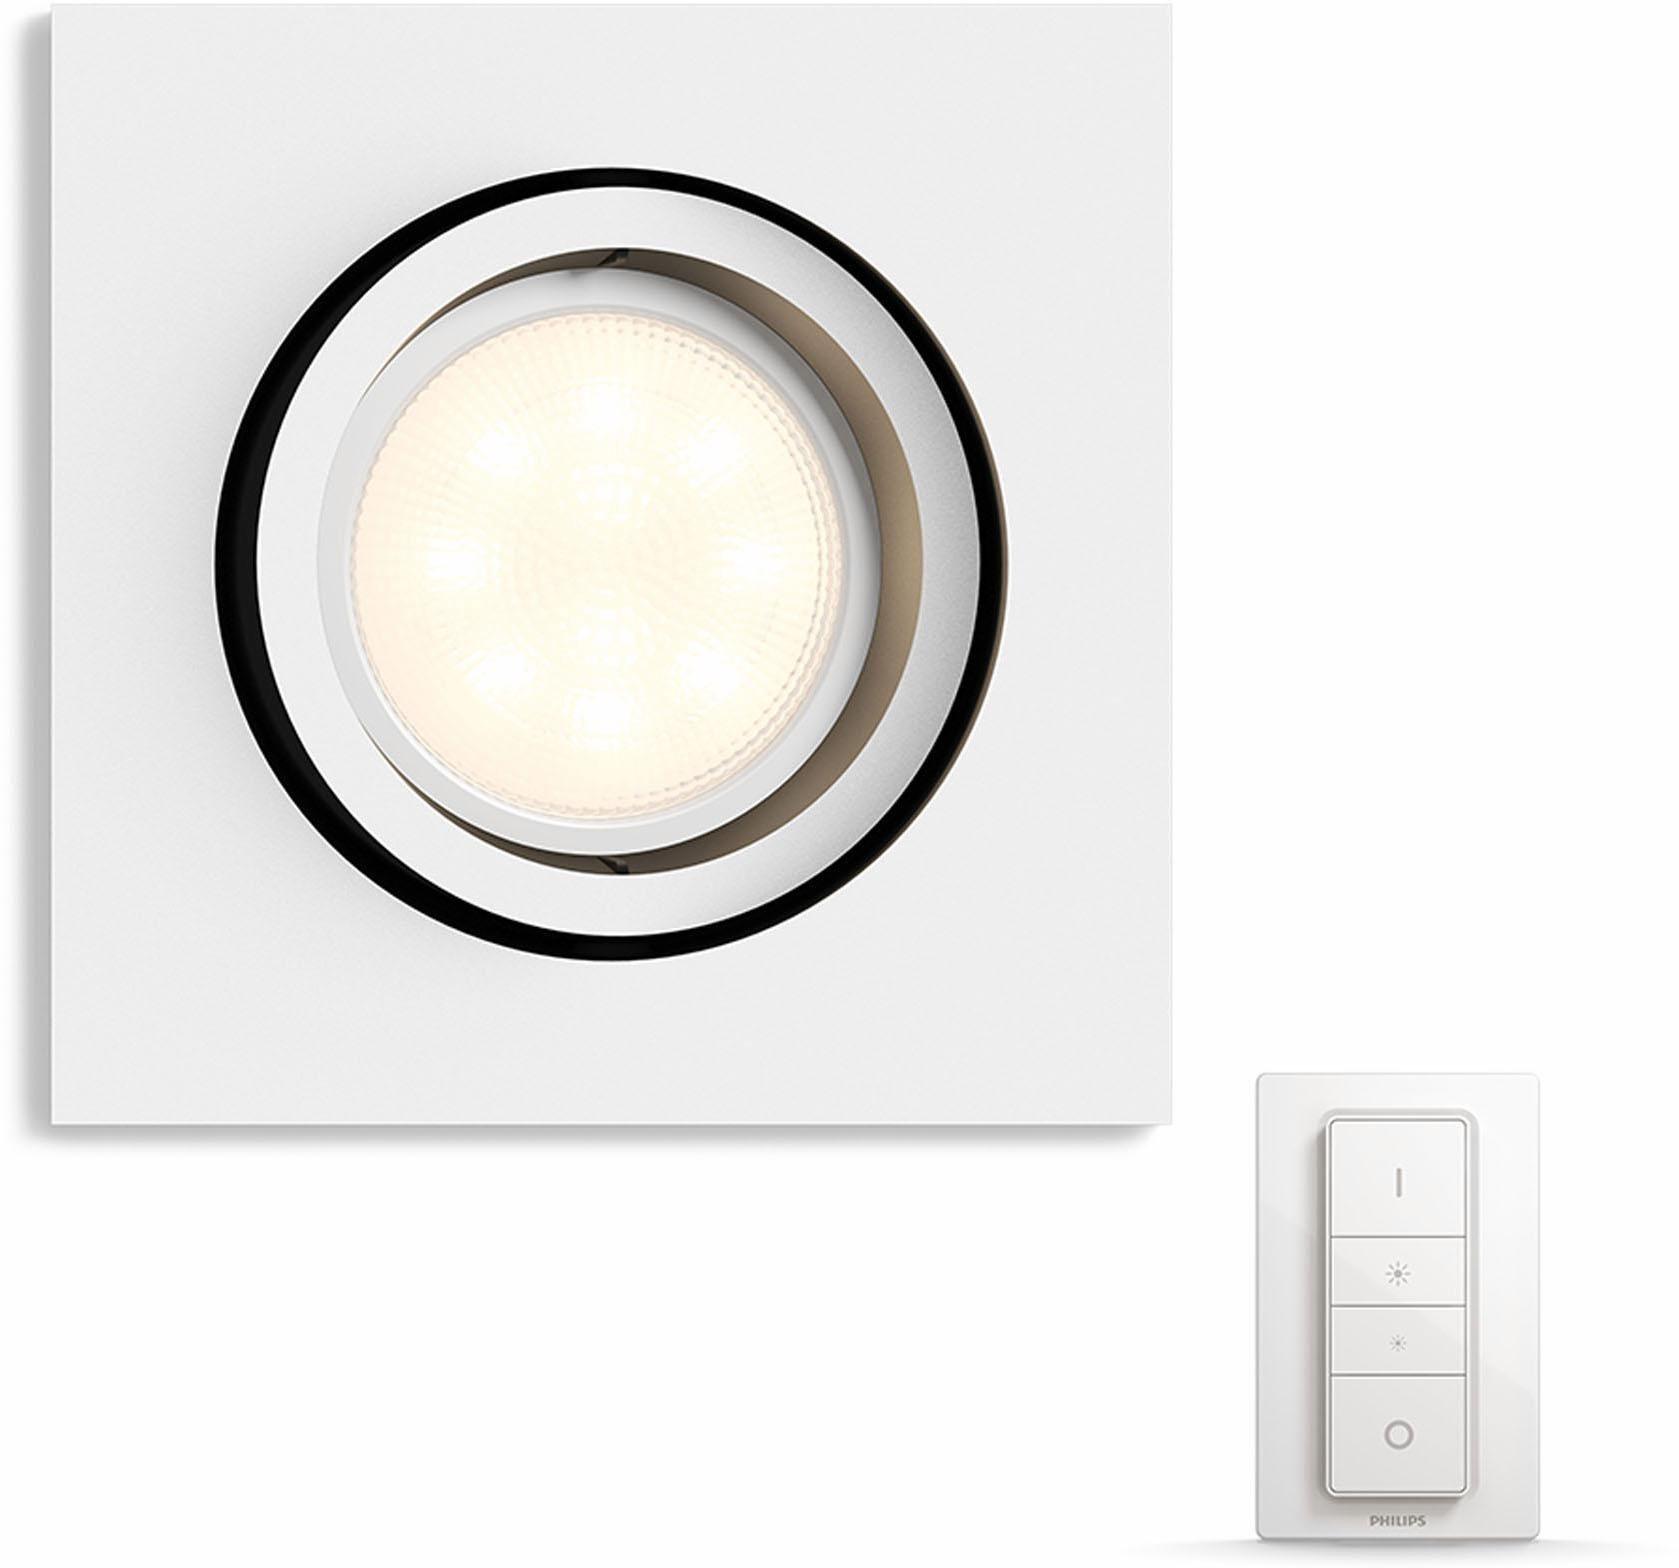 Philips Hue LED Einbaustrahler »Milliskin«, 1-flammig, Smart Home   Lampen > Strahler und Systeme > Einbaustrahler   Magenta   Philips Hue